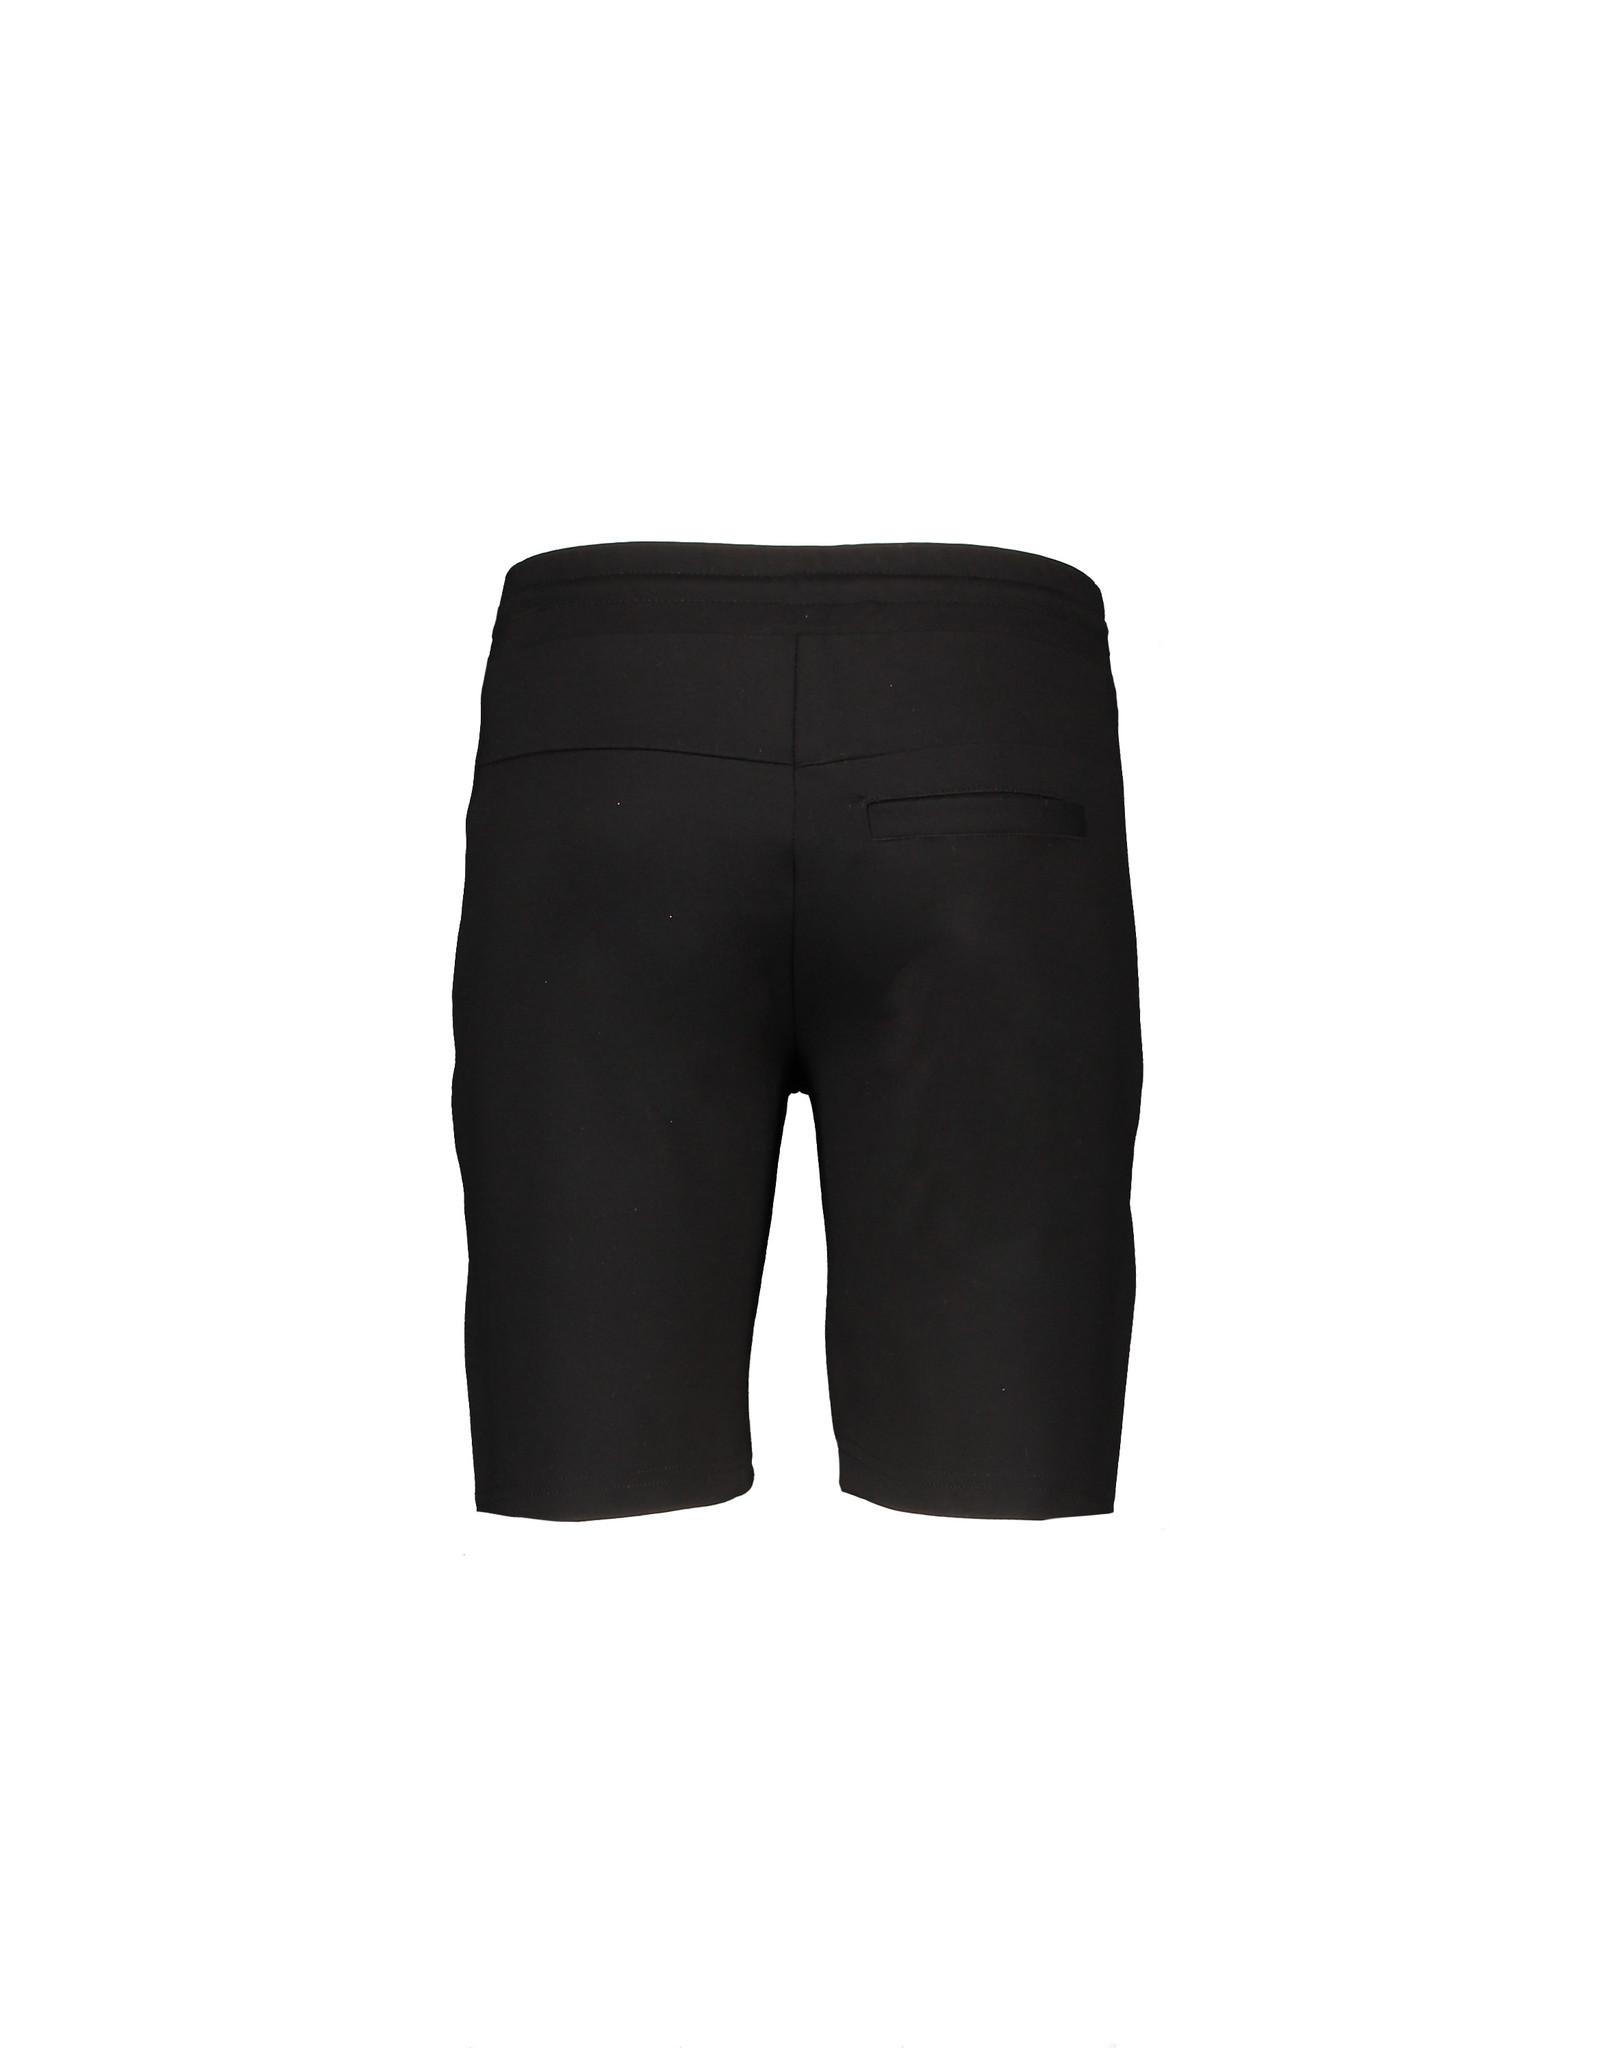 Bellaire Soram shorts